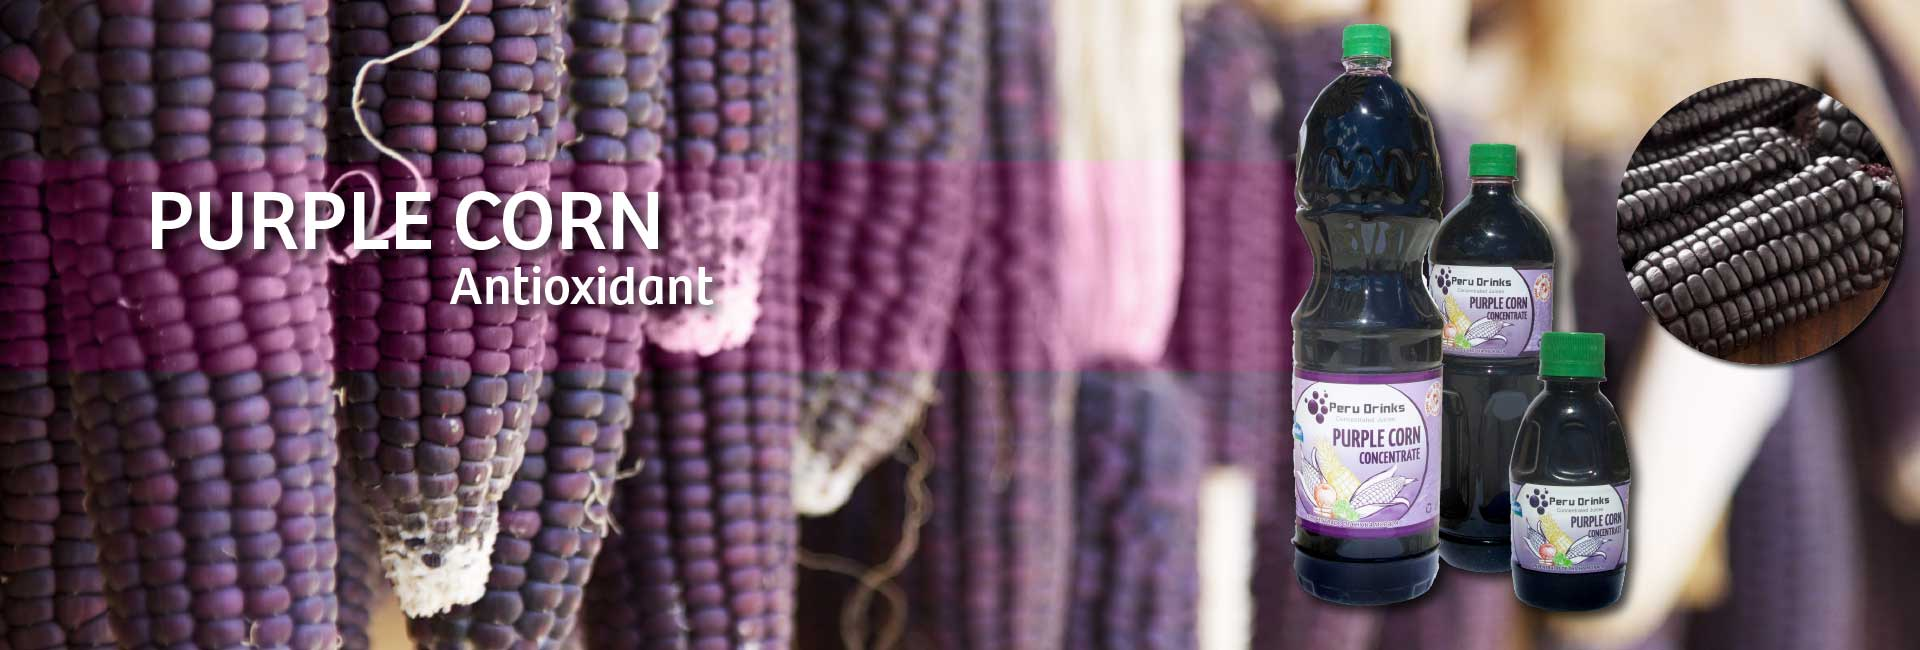 Header-Flurescent-New-Bottles_purple-corn